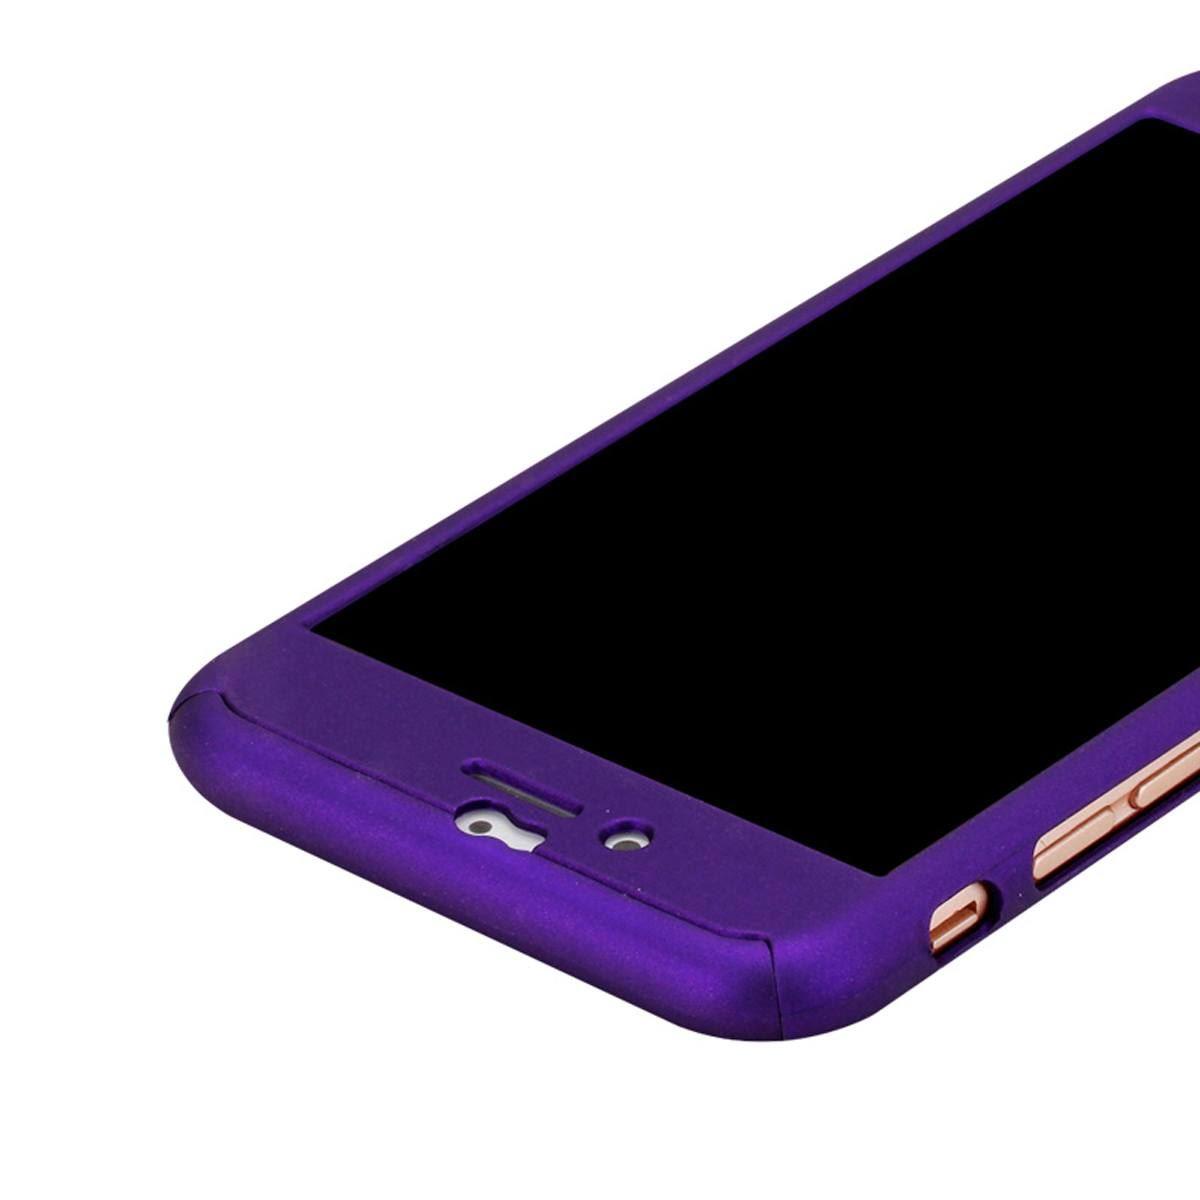 For-Apple-iPhone-XS-Max-XR-Hybrid-360-Slim-Ultra-Thin-Heavy-Duty-Shockproof-Case Indexbild 83